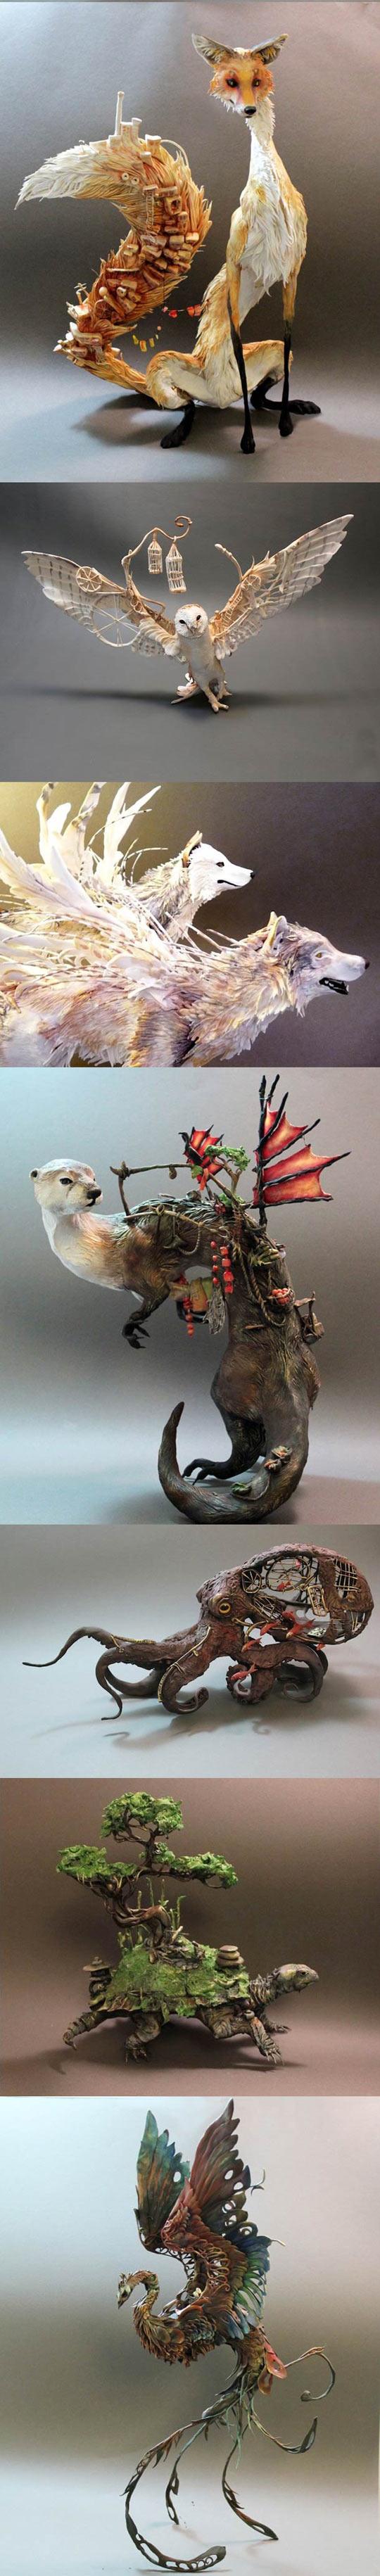 cool-sculpture-animals-boar-wolf